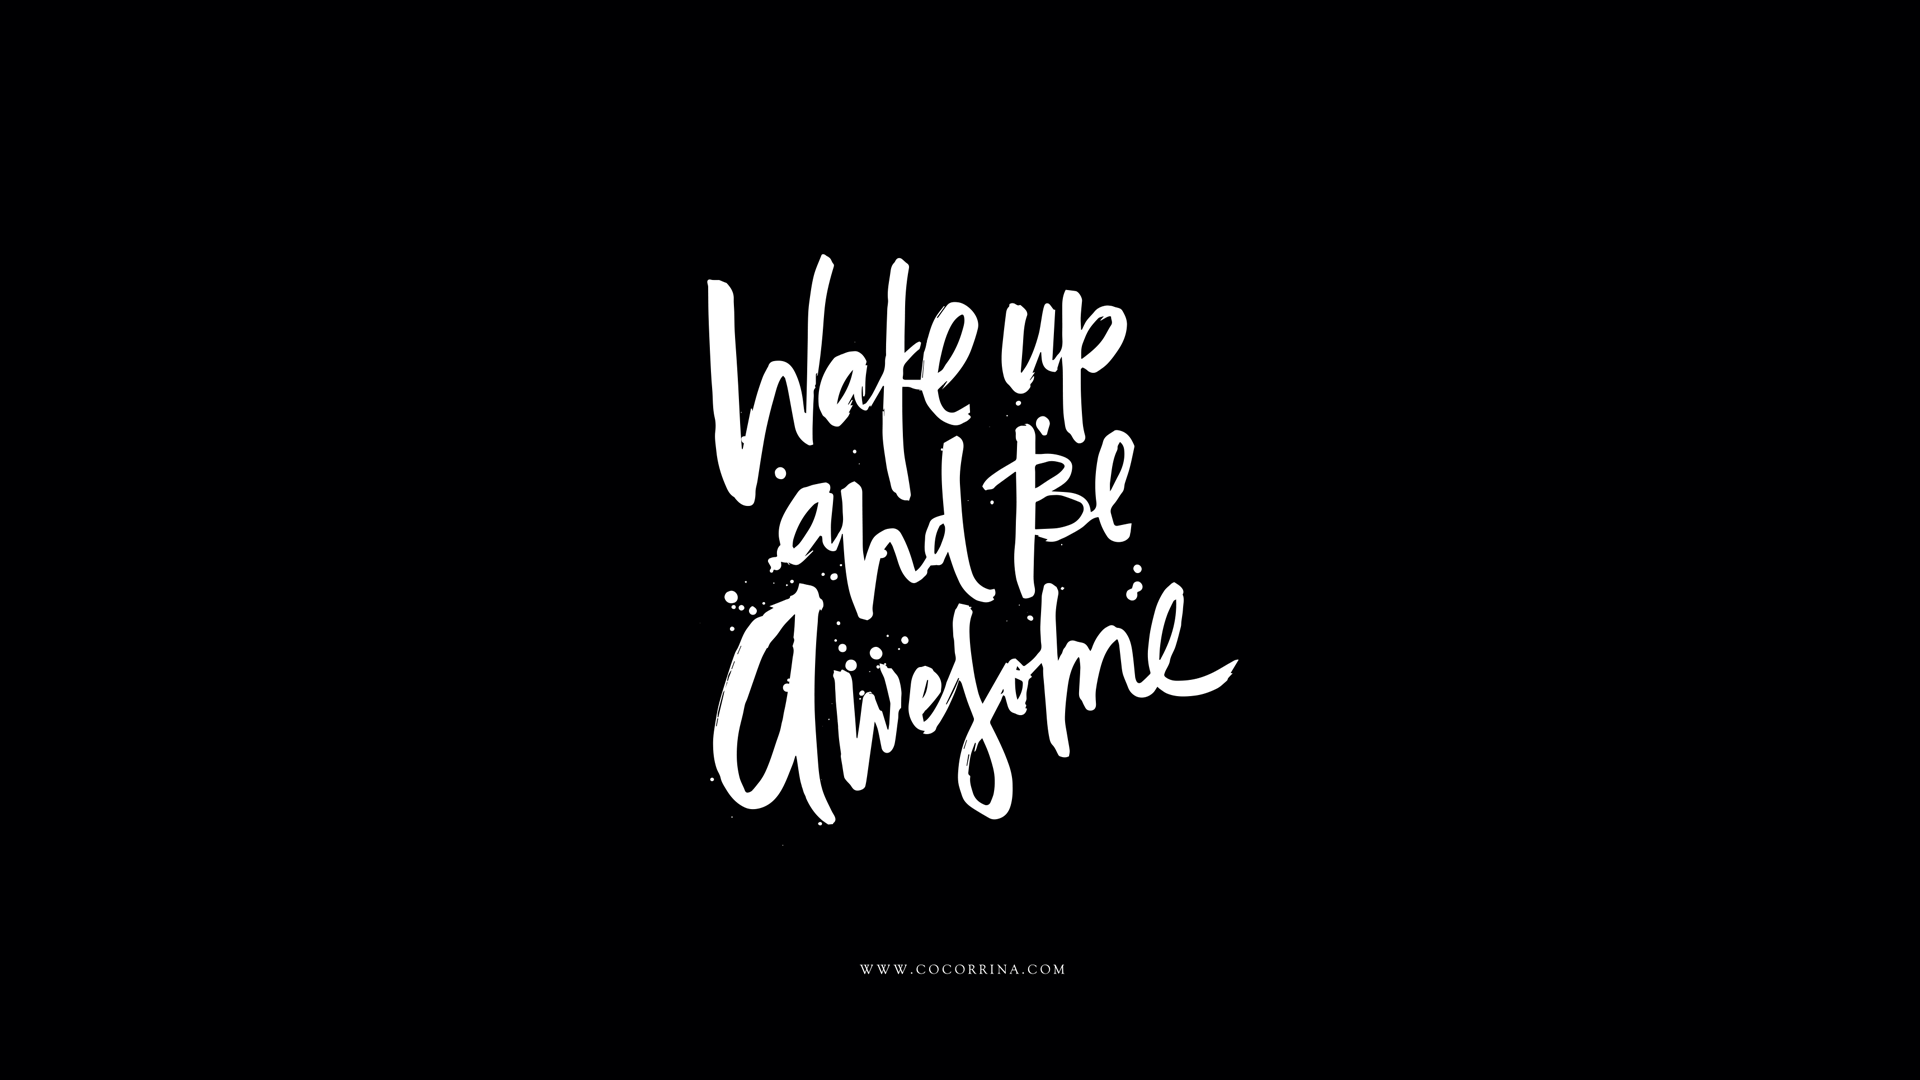 Black White Calligraphy Wake Up Be Awesome Desktop